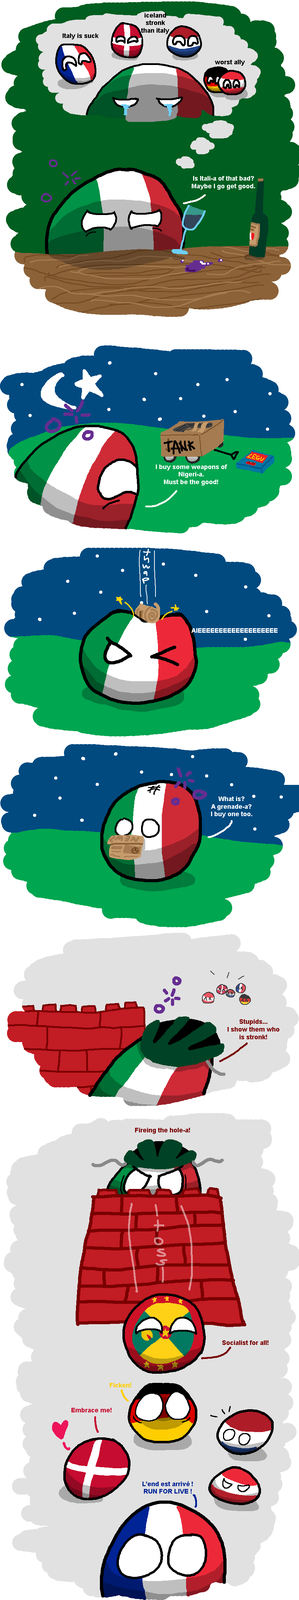 Italian Military Jokes | Know Your Meme